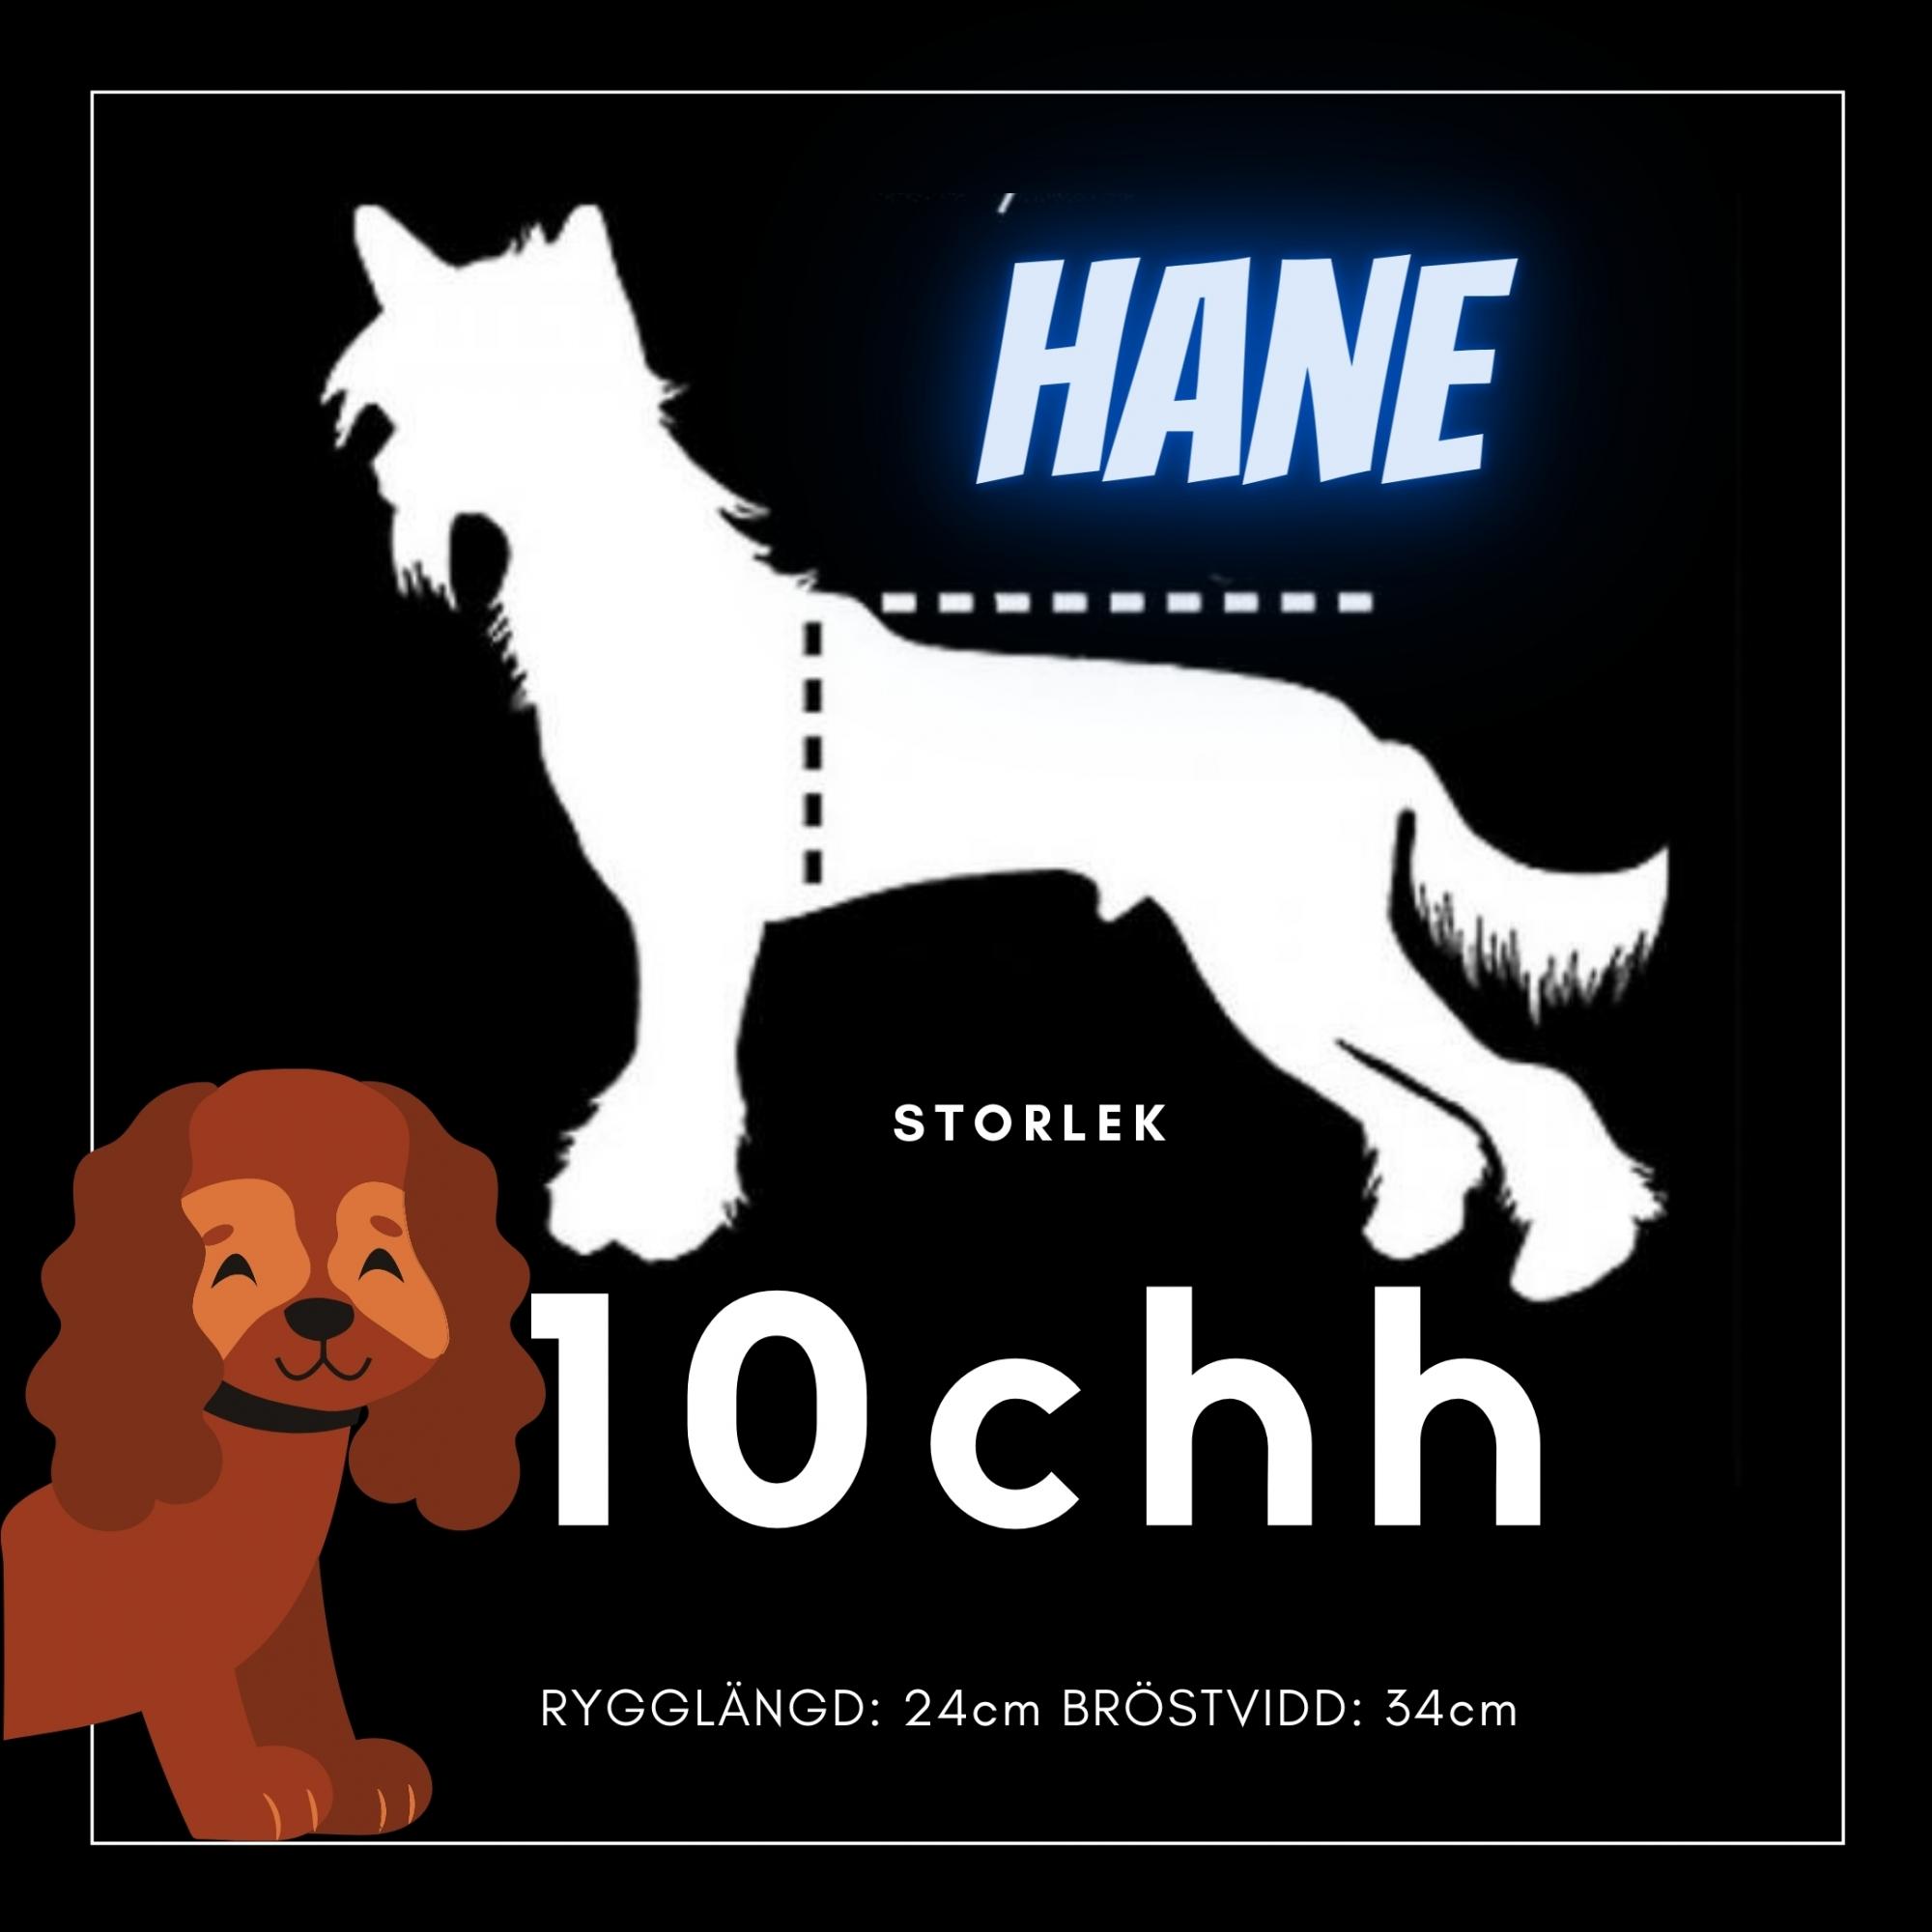 Hane Storlek 10chh - Passion For Pet Fashion